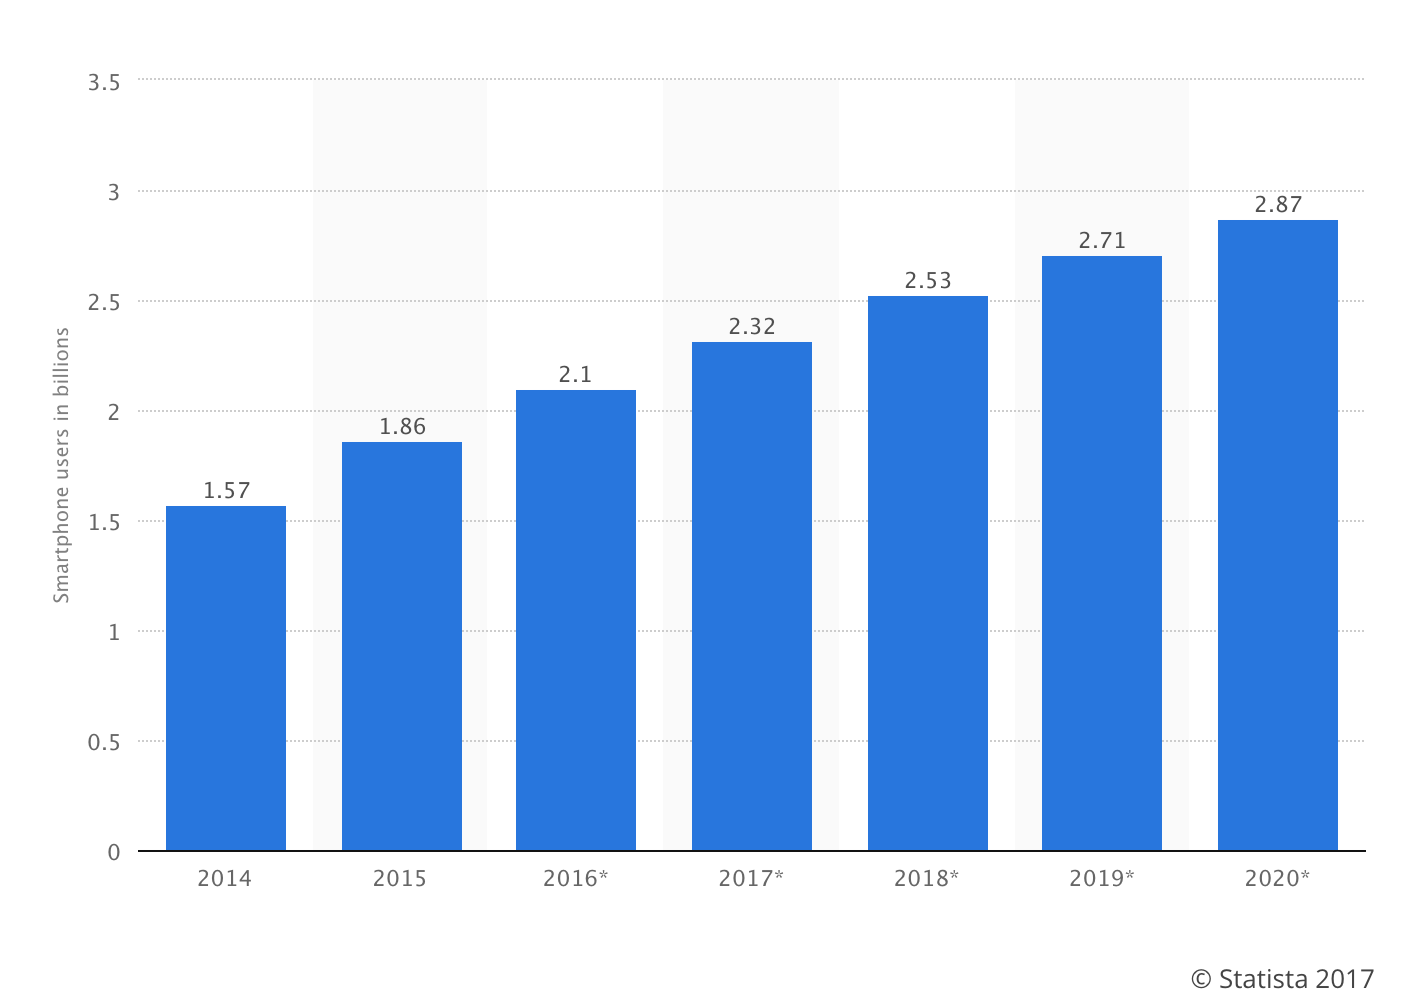 Smartphone Users In Billions Graph